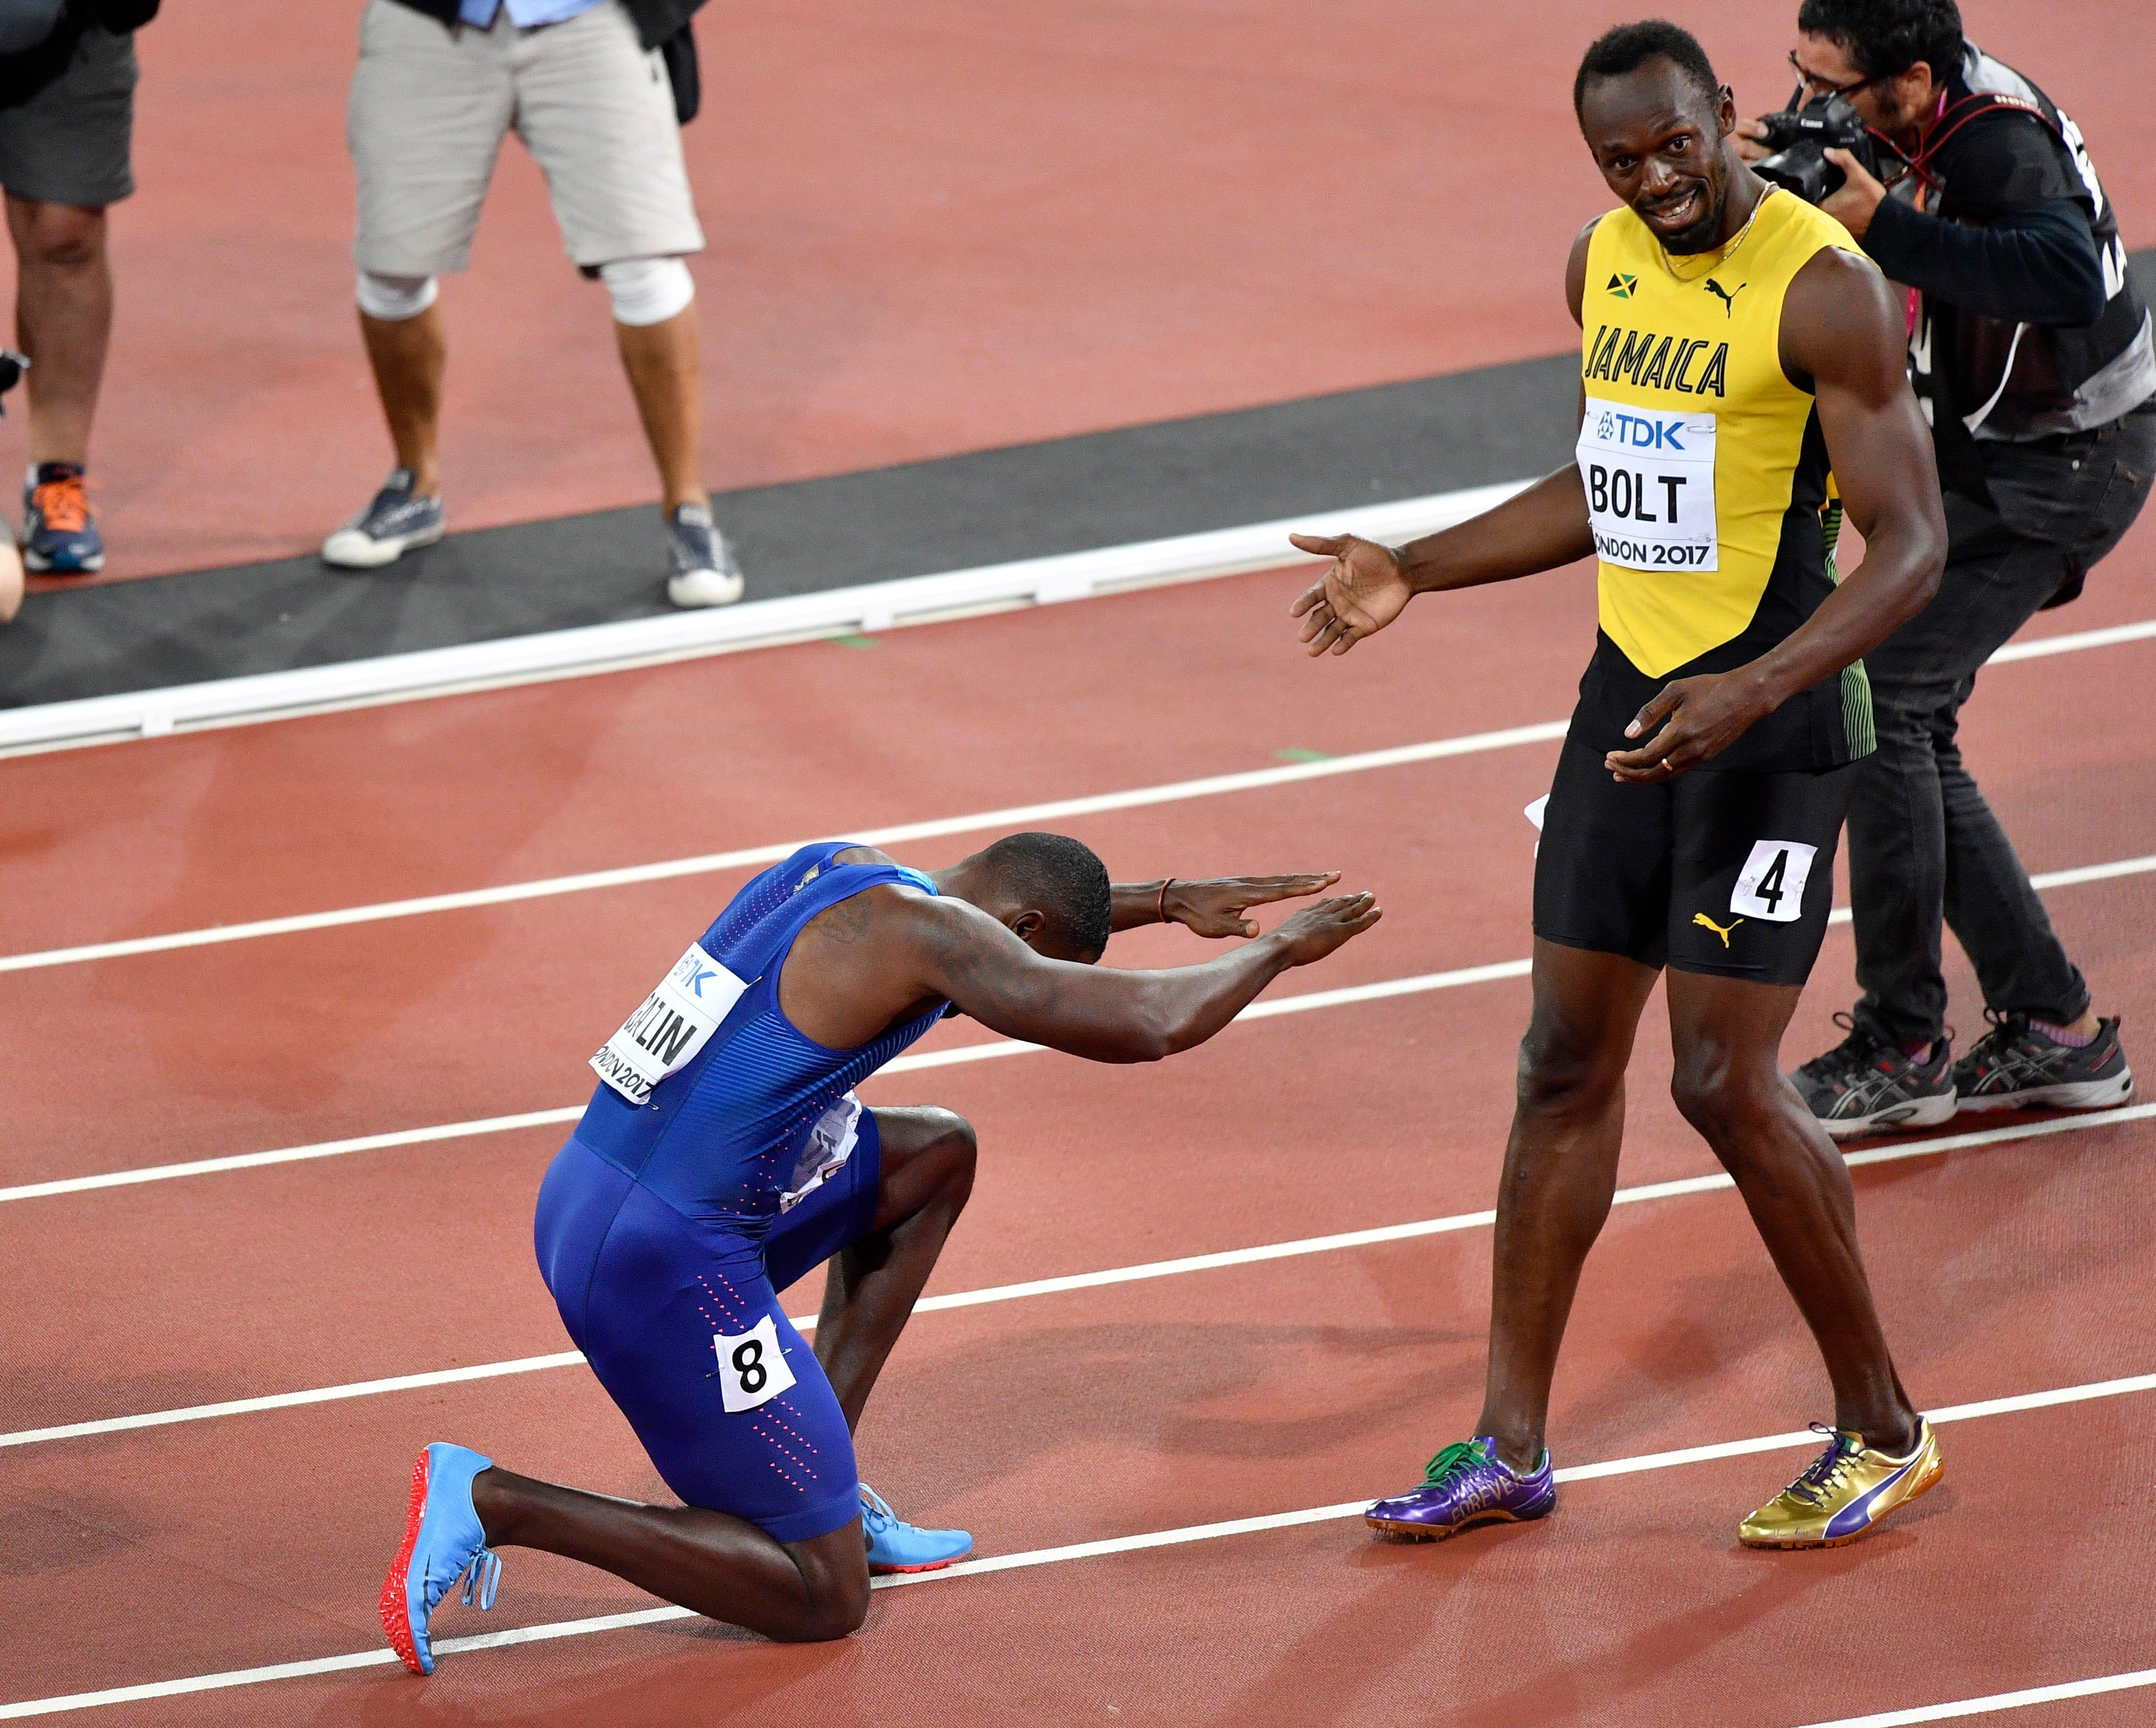 Justin Gatlin graciously bows to Usain Bolt after 100m upset